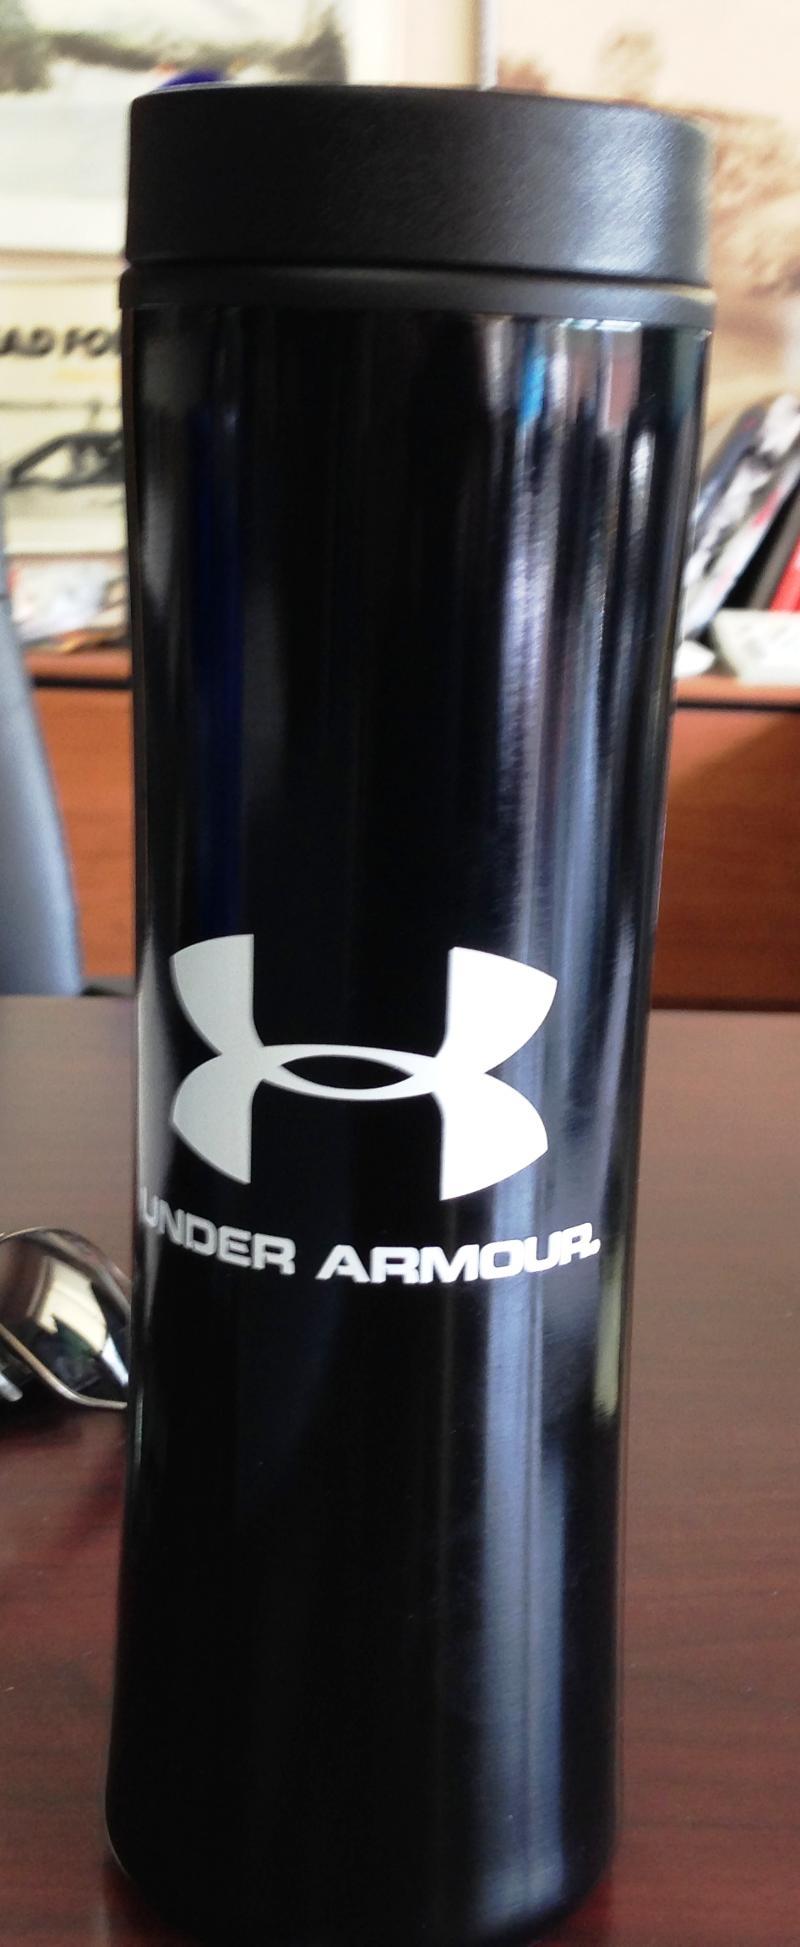 under armour mug